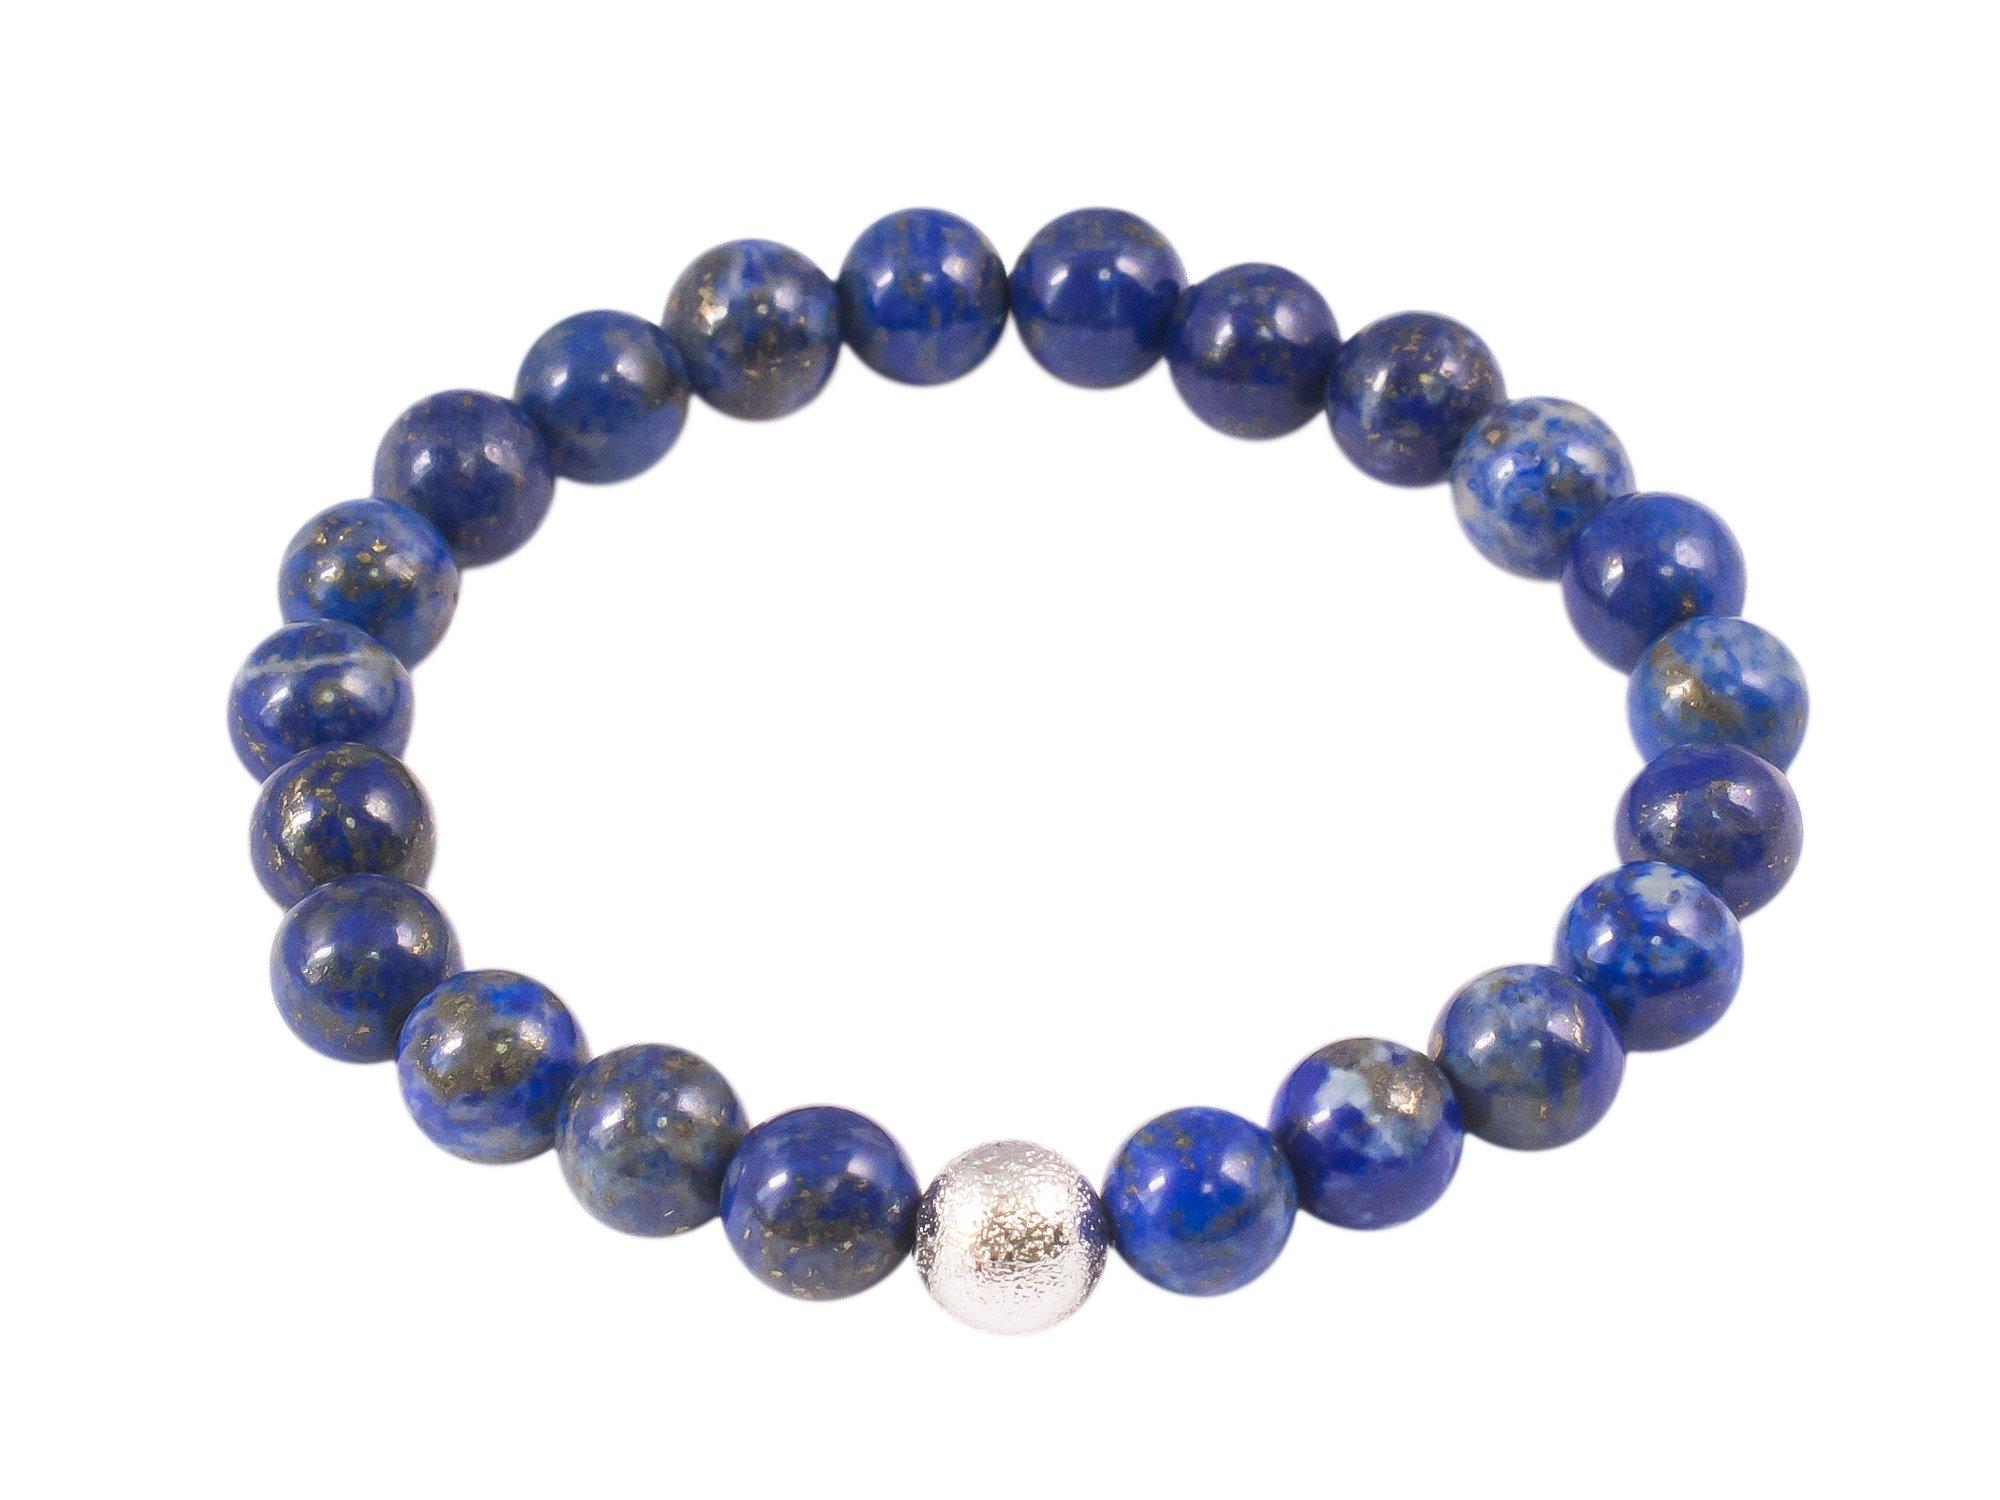 Shinus OKIKO Women Bracelet Handmade Gemstone Charm Rosary Boho Fashion Jewelry Natural Gift Design